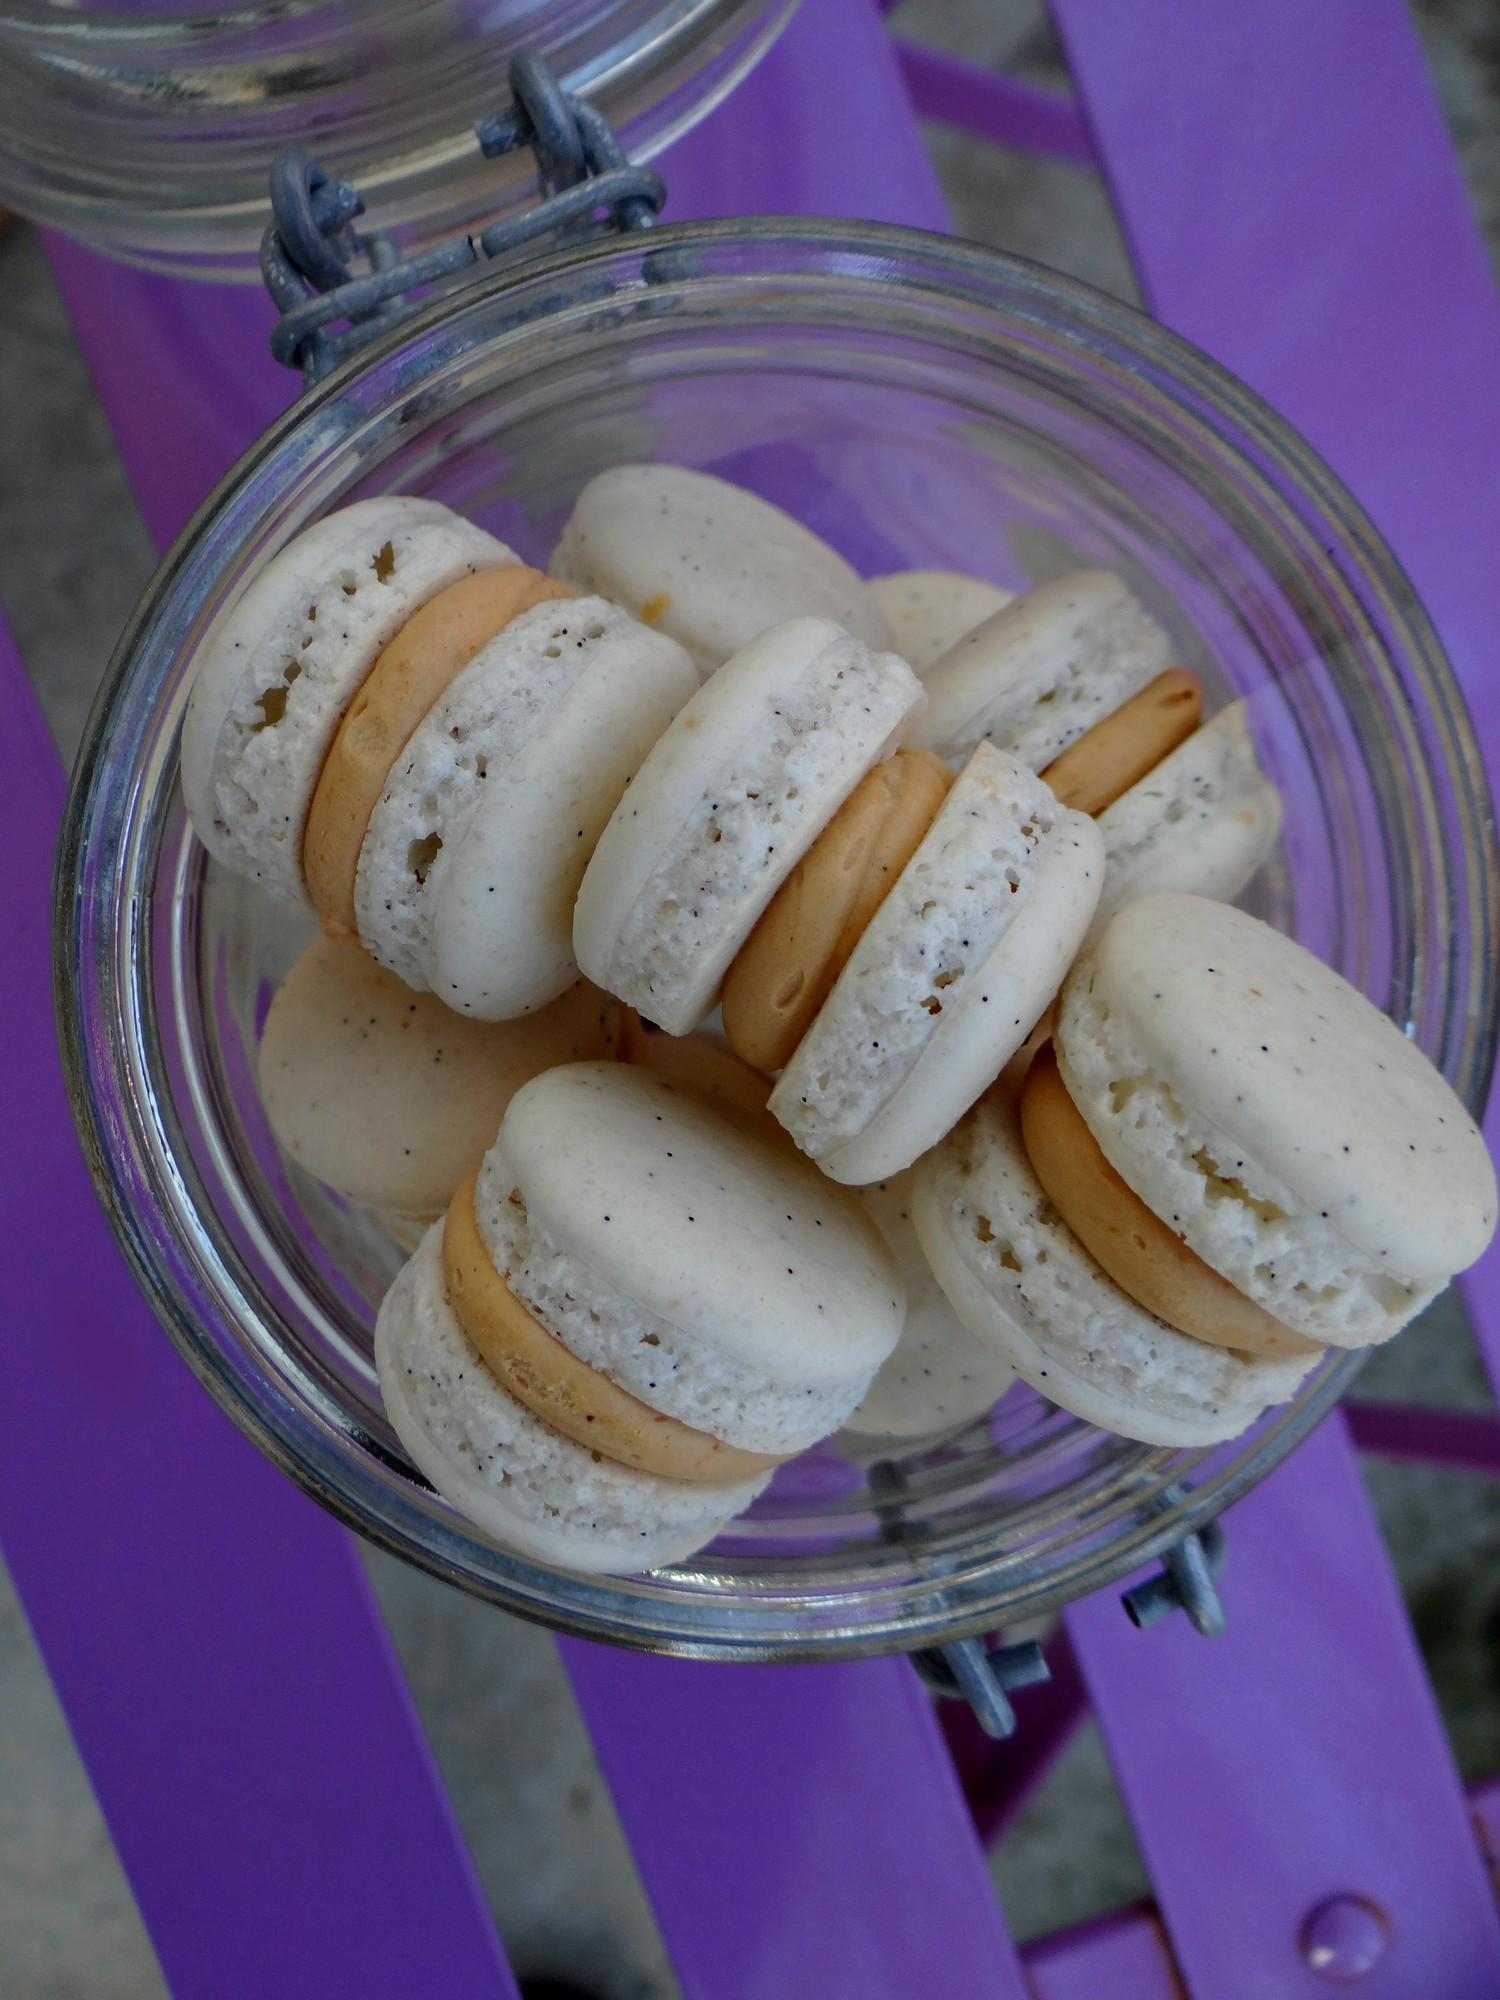 Mini-macarons tout doux vanille et caramel salé